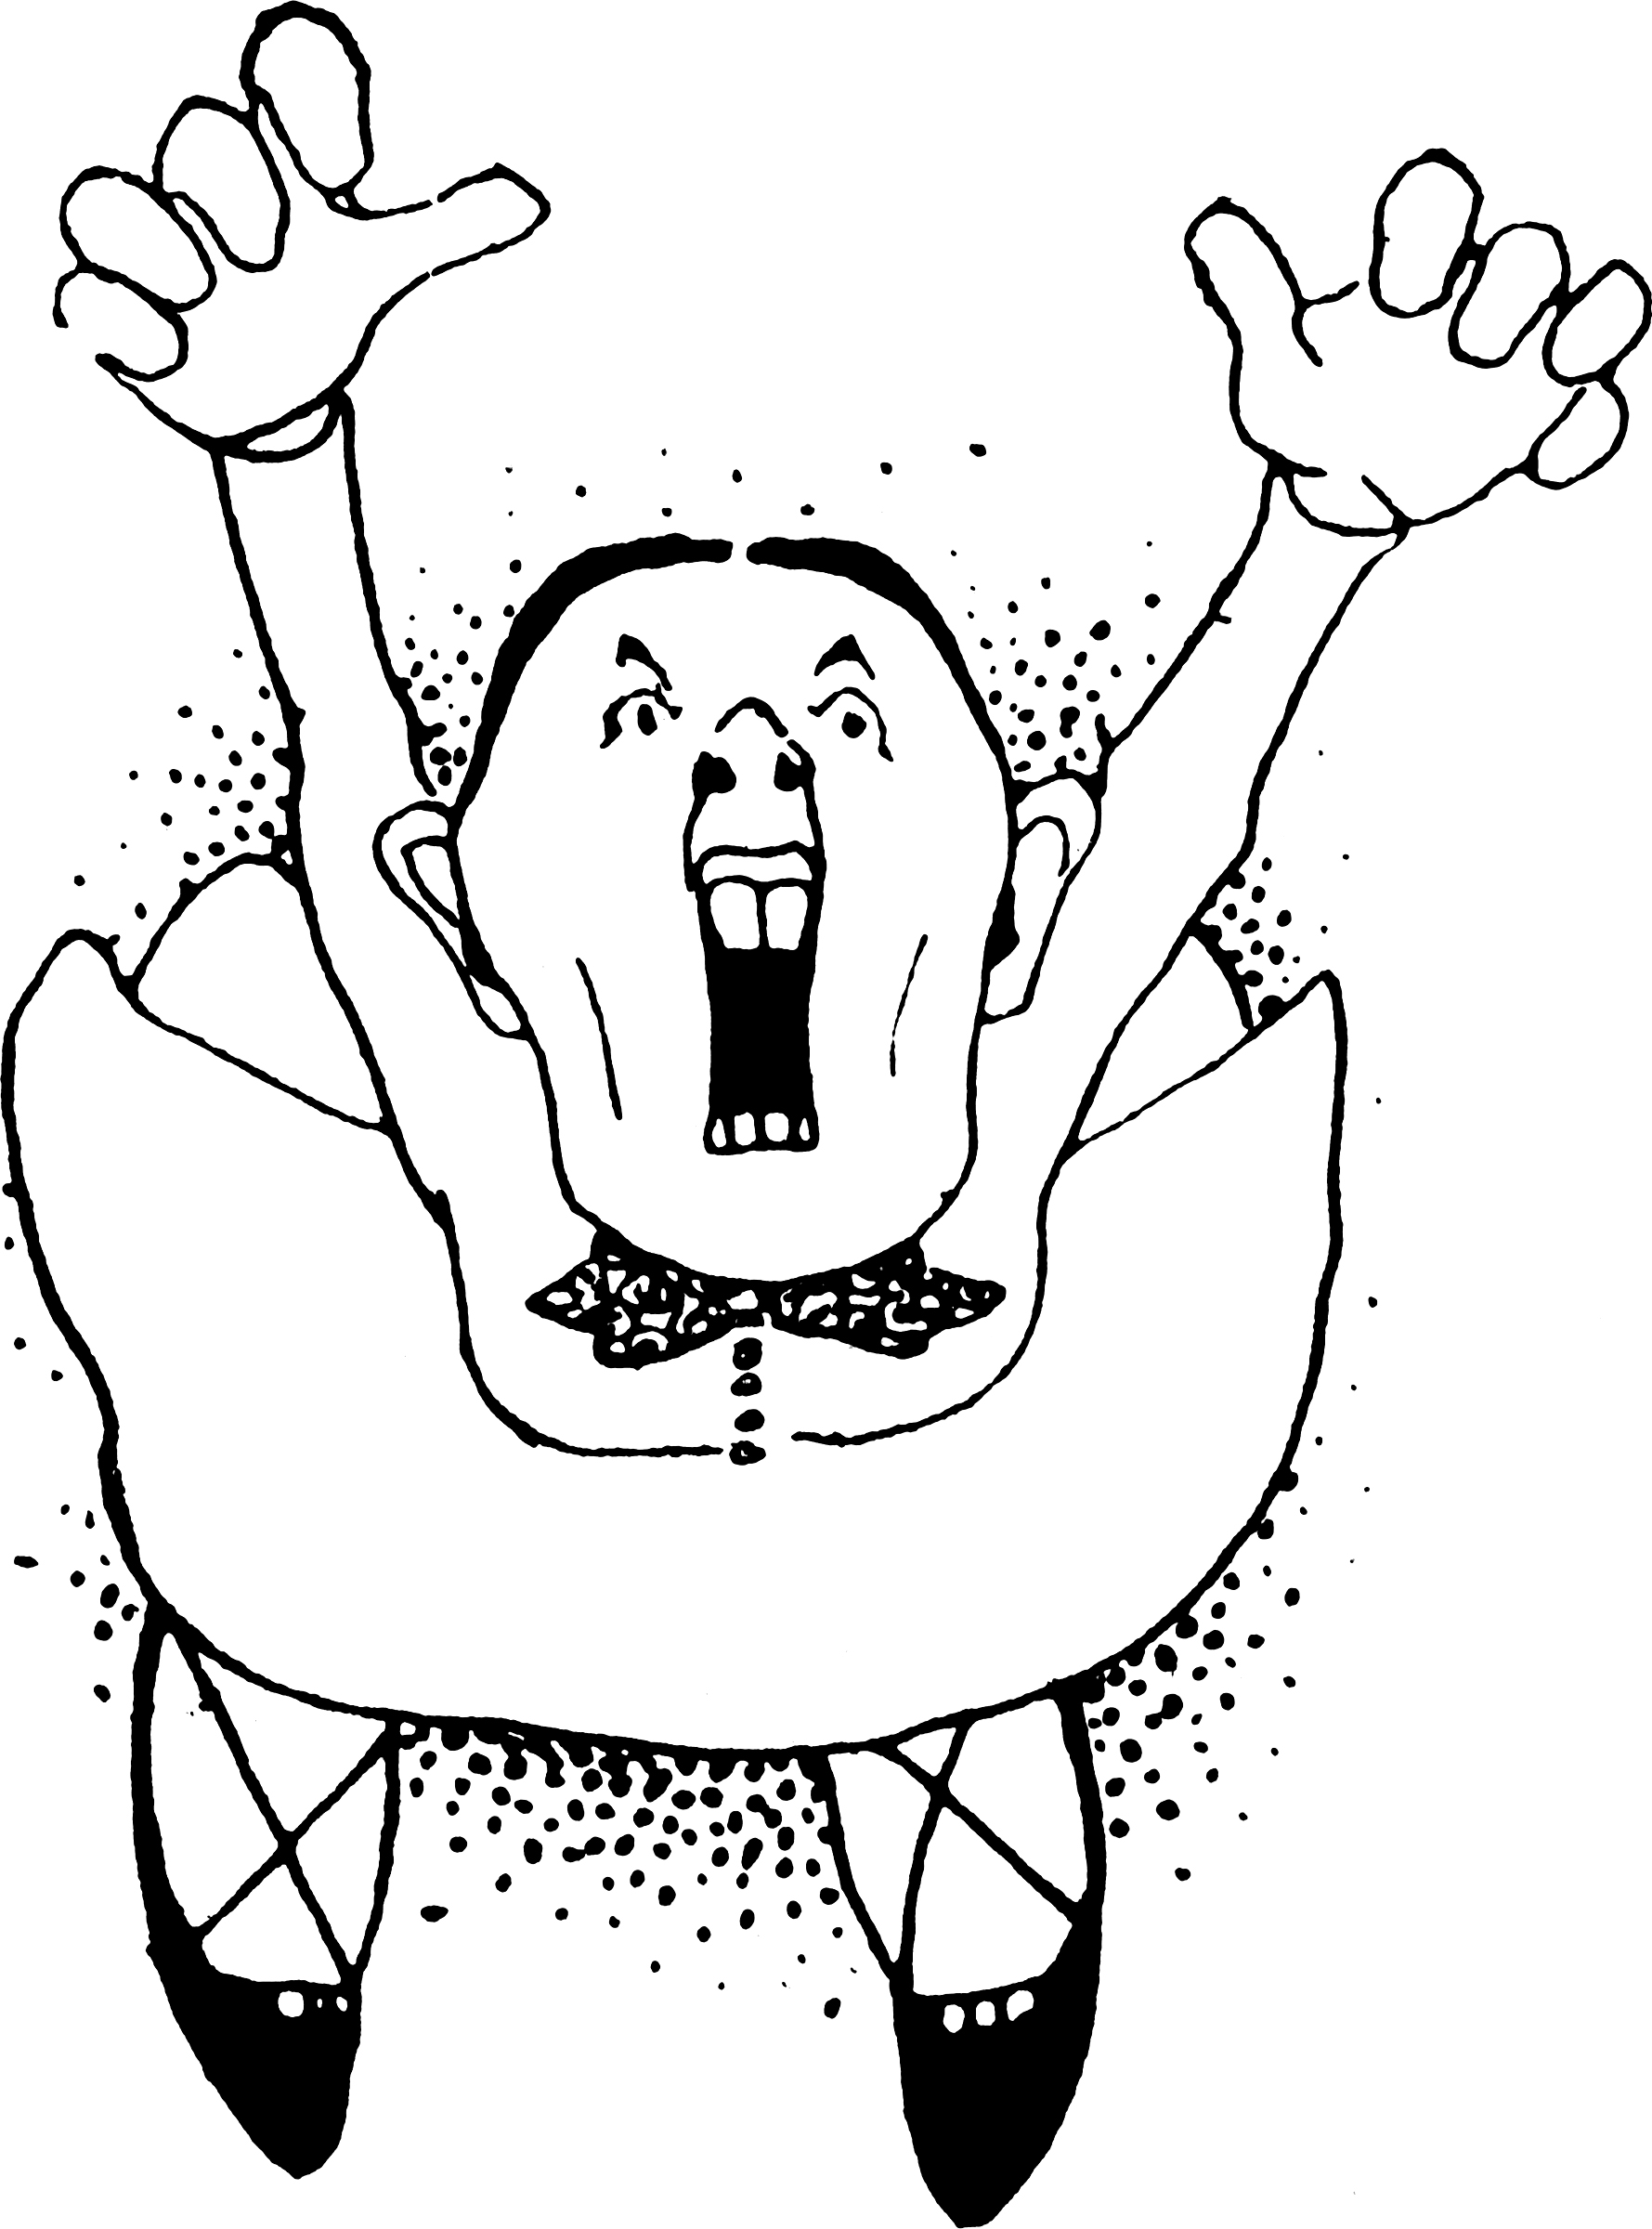 Women clipart shrew Woman Screeching Deranged Woman Grotesque